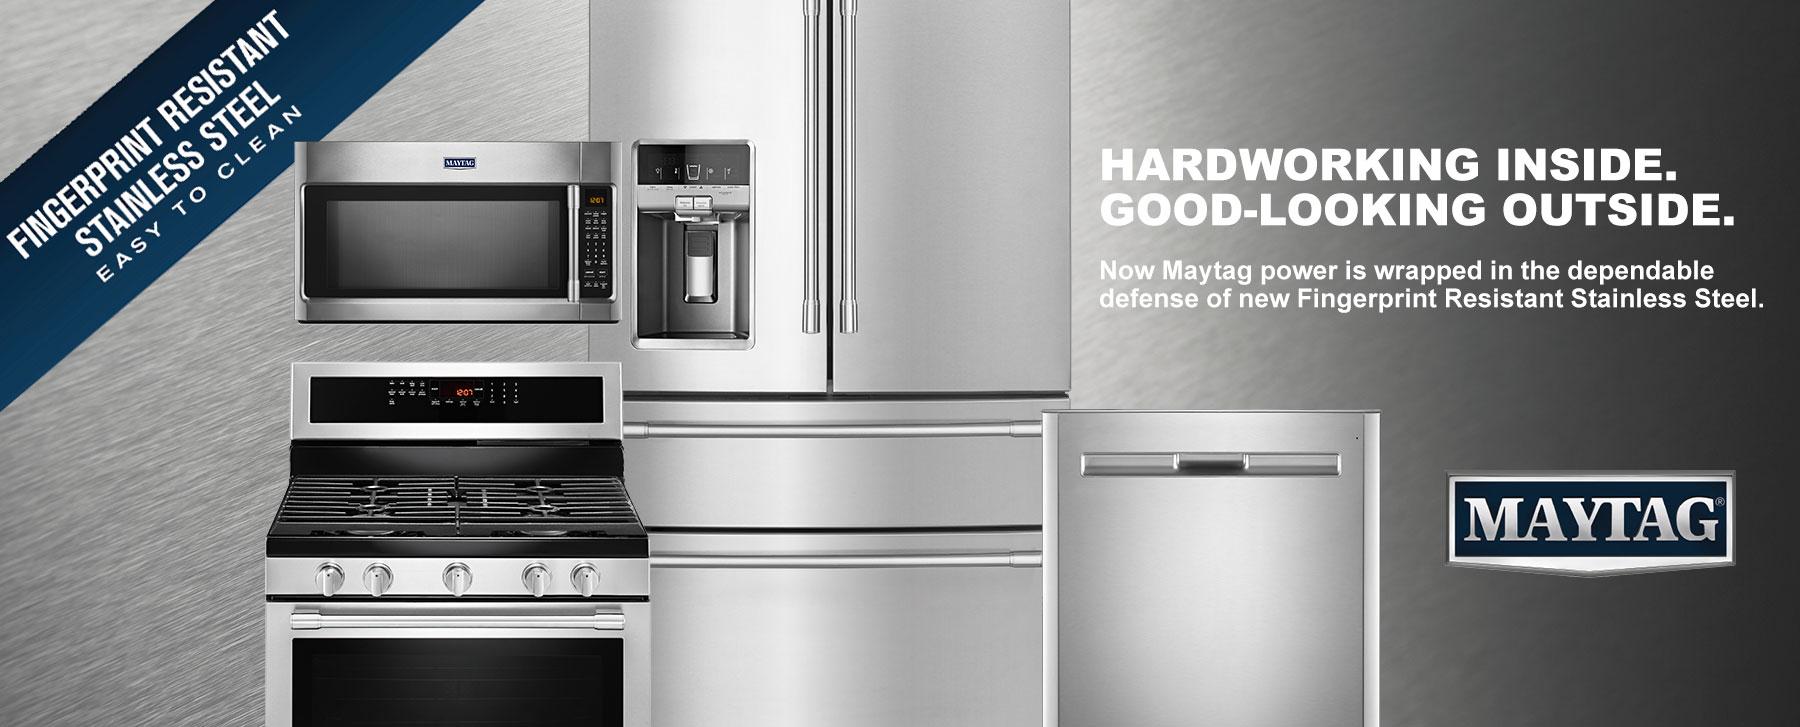 Maytag Appliances Web 3 0 Refrigerator Amp Washing Machine